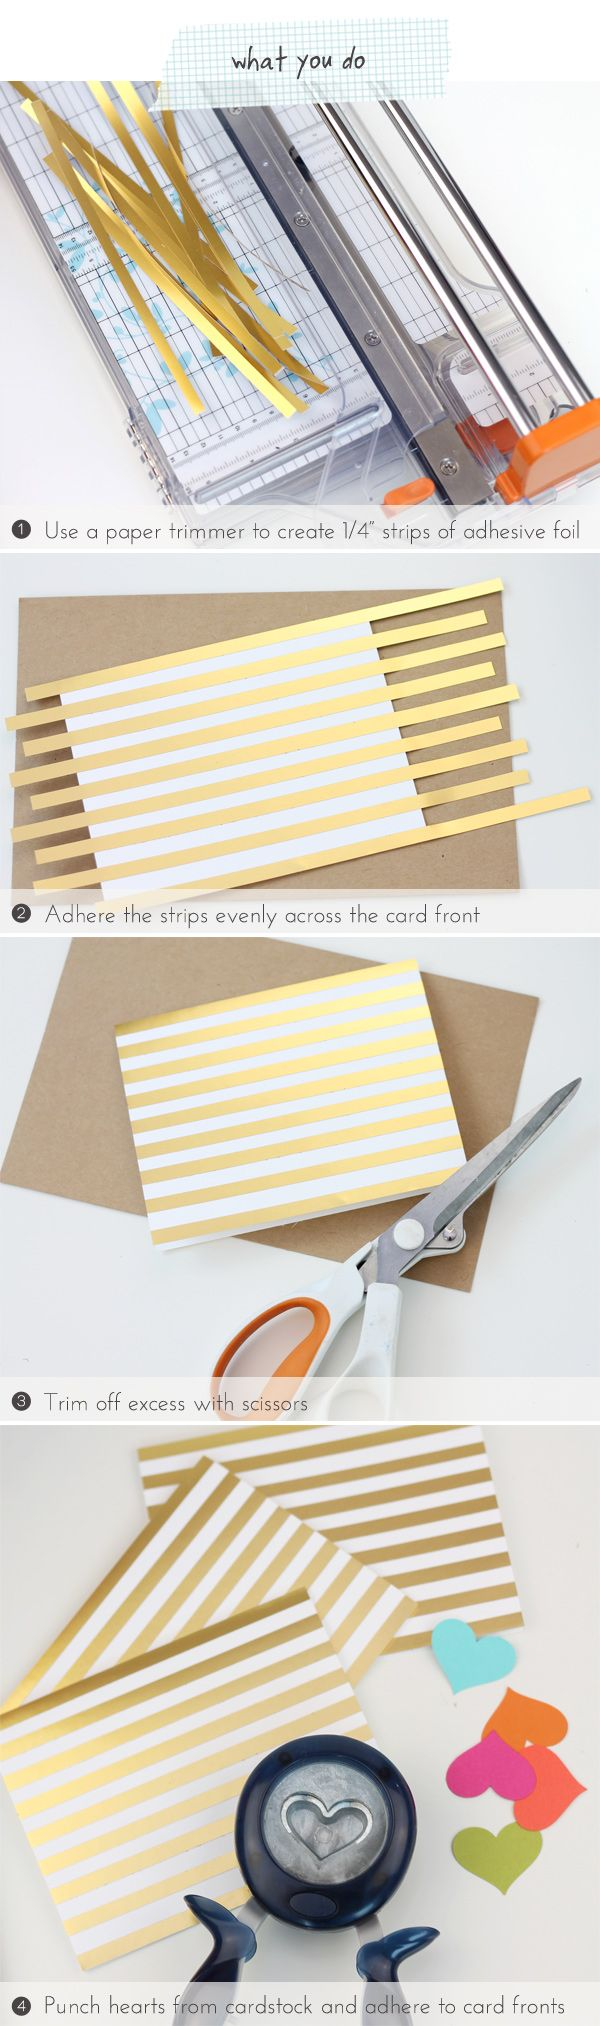 Easy Like Sunday Morning: Foil Striped Stationery